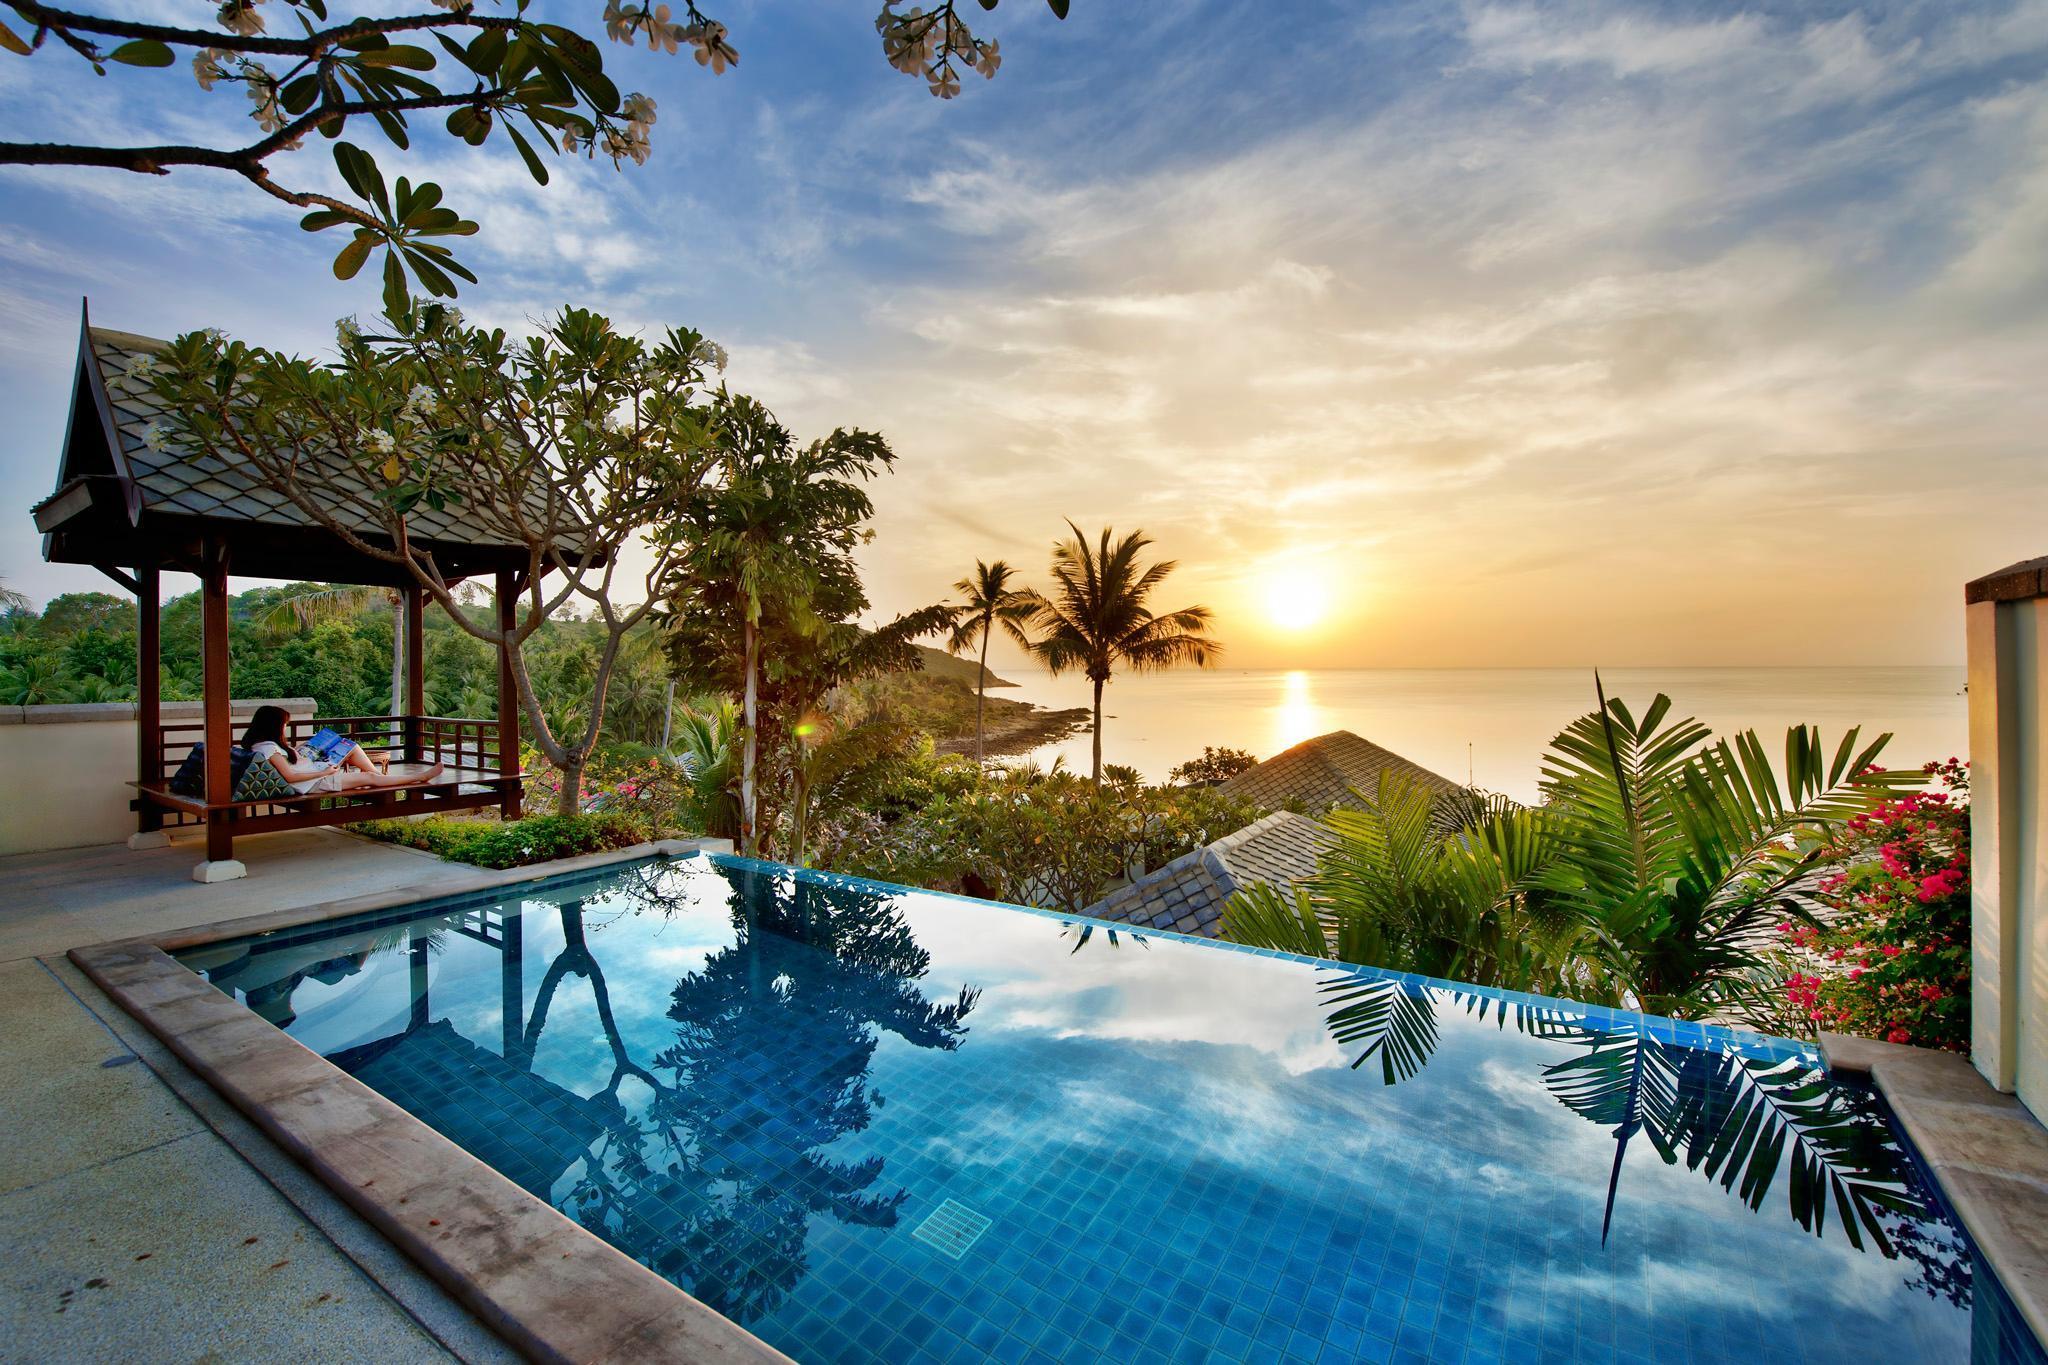 Villa Aquamarine In Luxury 5 Star Hotel